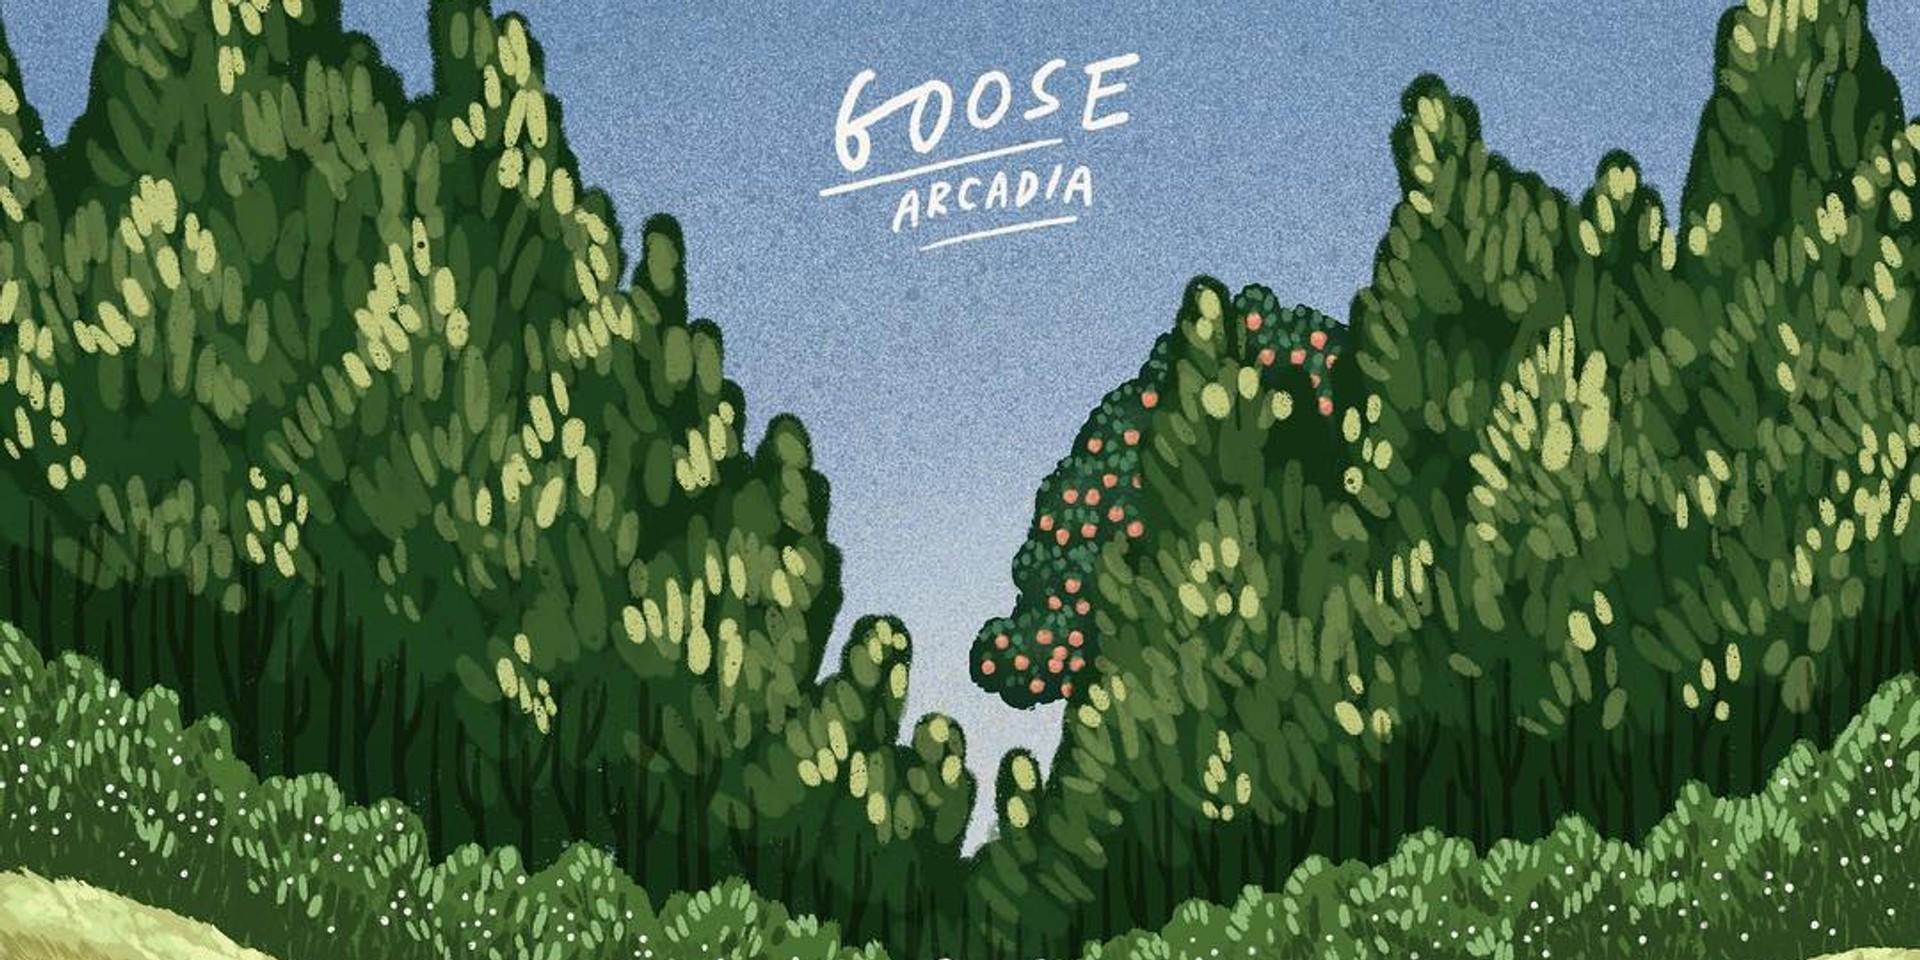 Goose发行第二张EP 带听众走近遥不可及的《Arcadia》